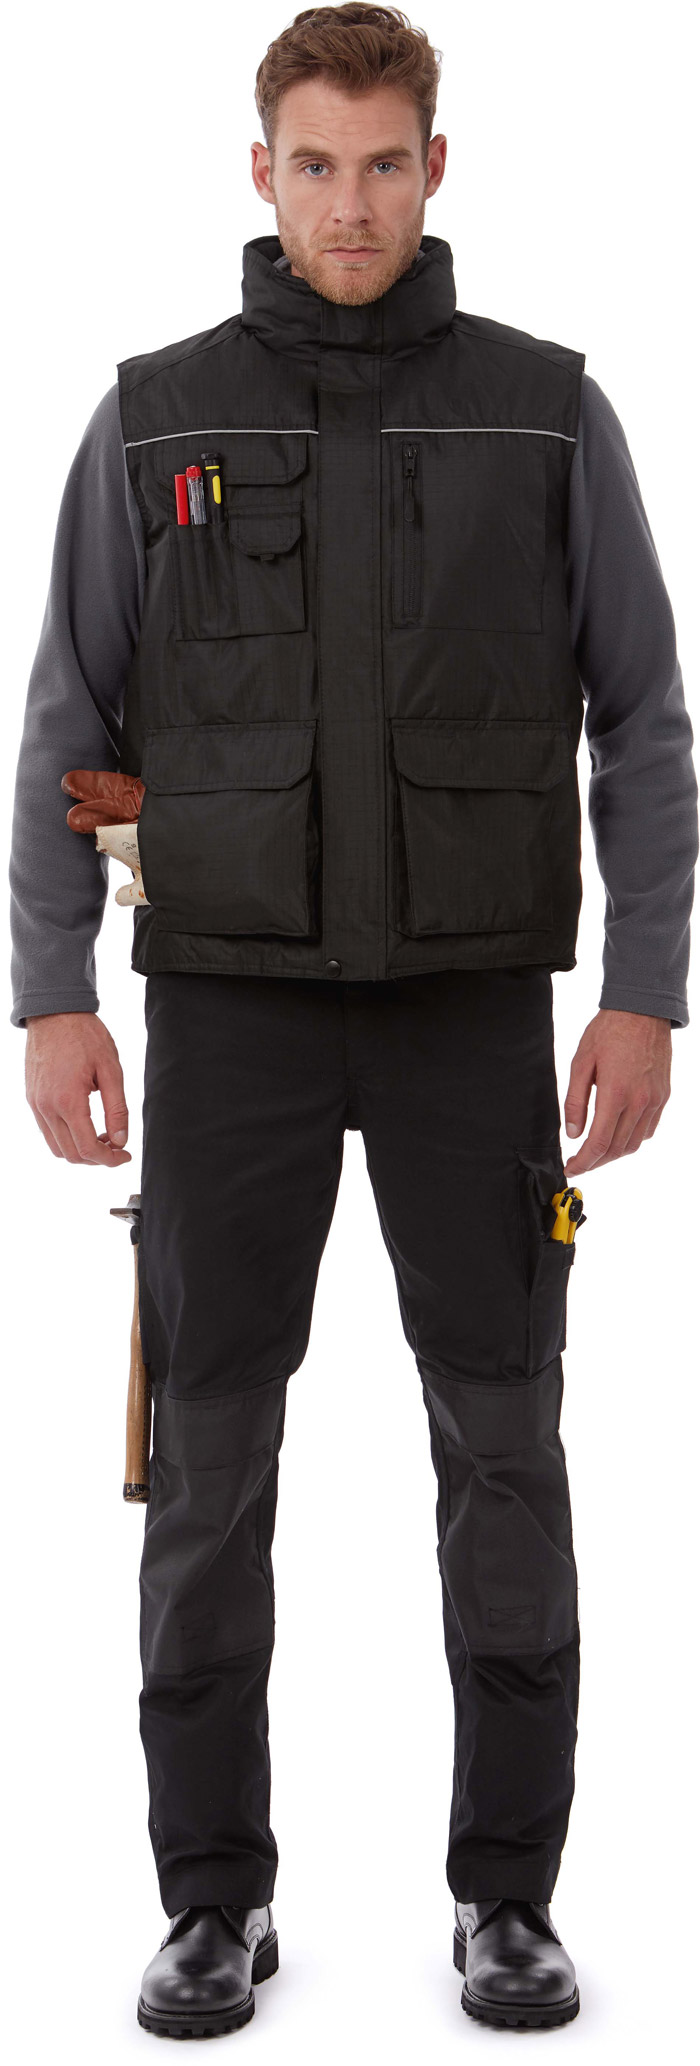 Bodywarmer expert pro - CGJUC40